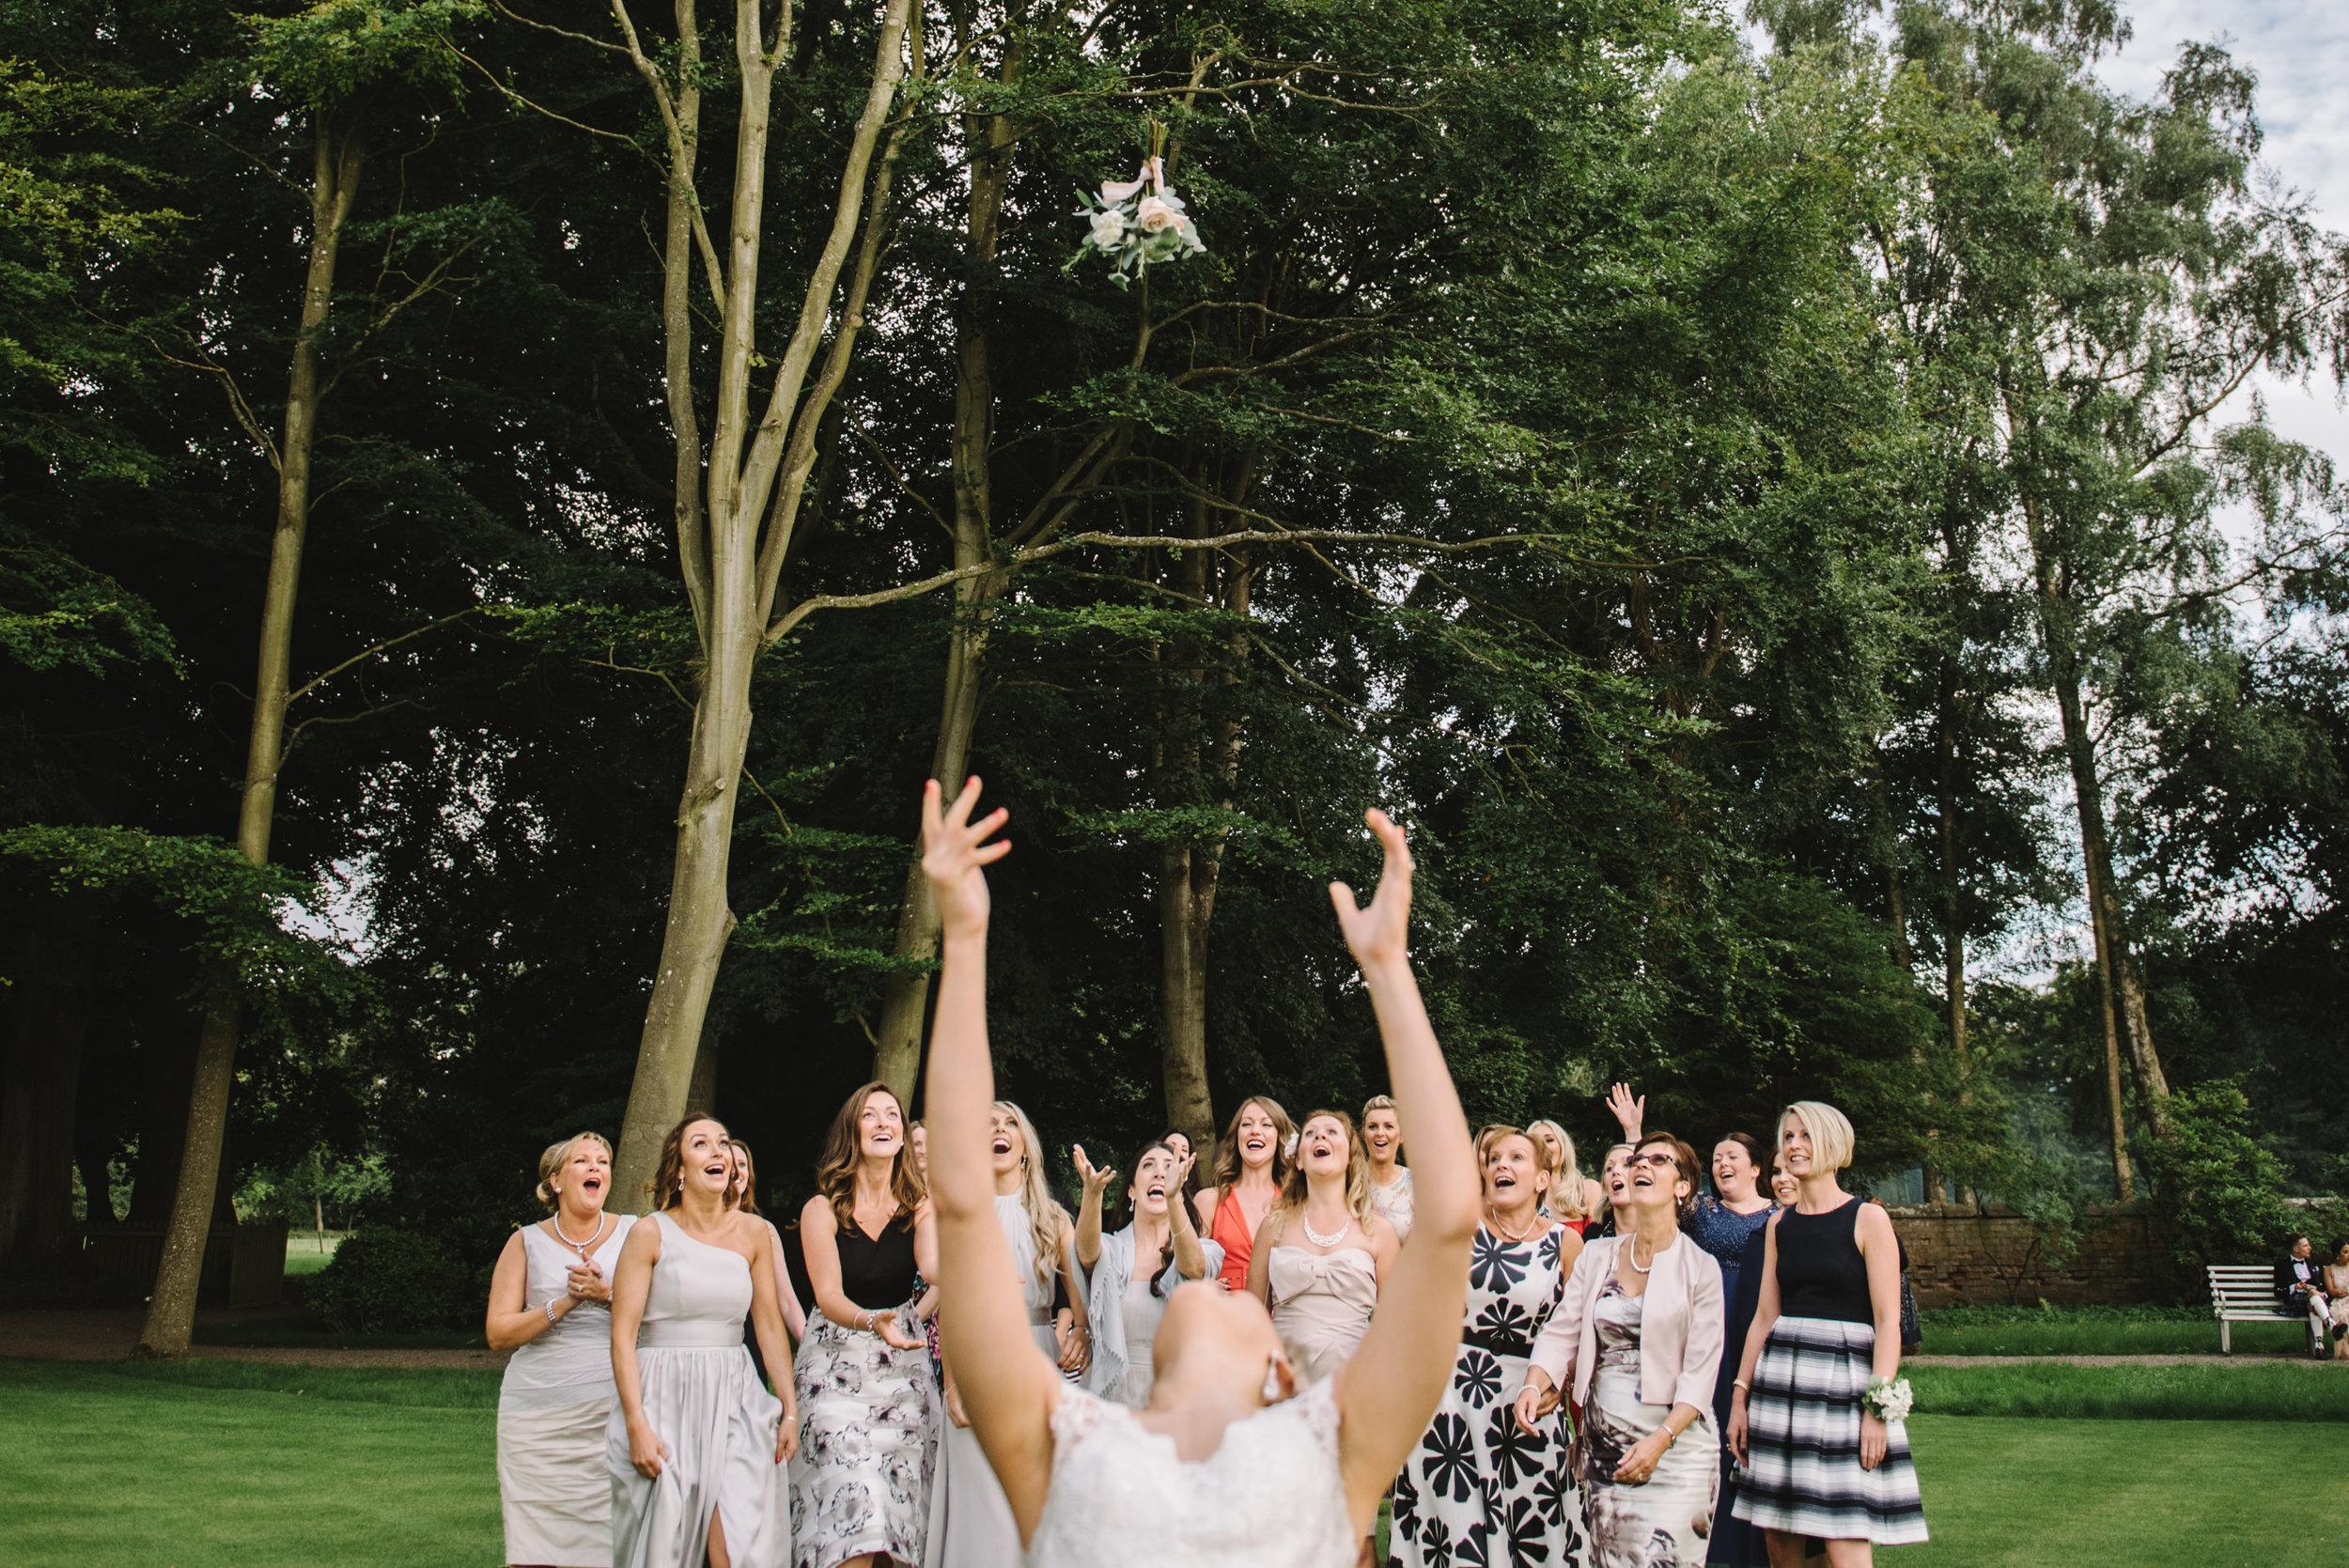 0194-alternative-wedding-portrait-family-kids-photographer-glasgow-scotland.JPG